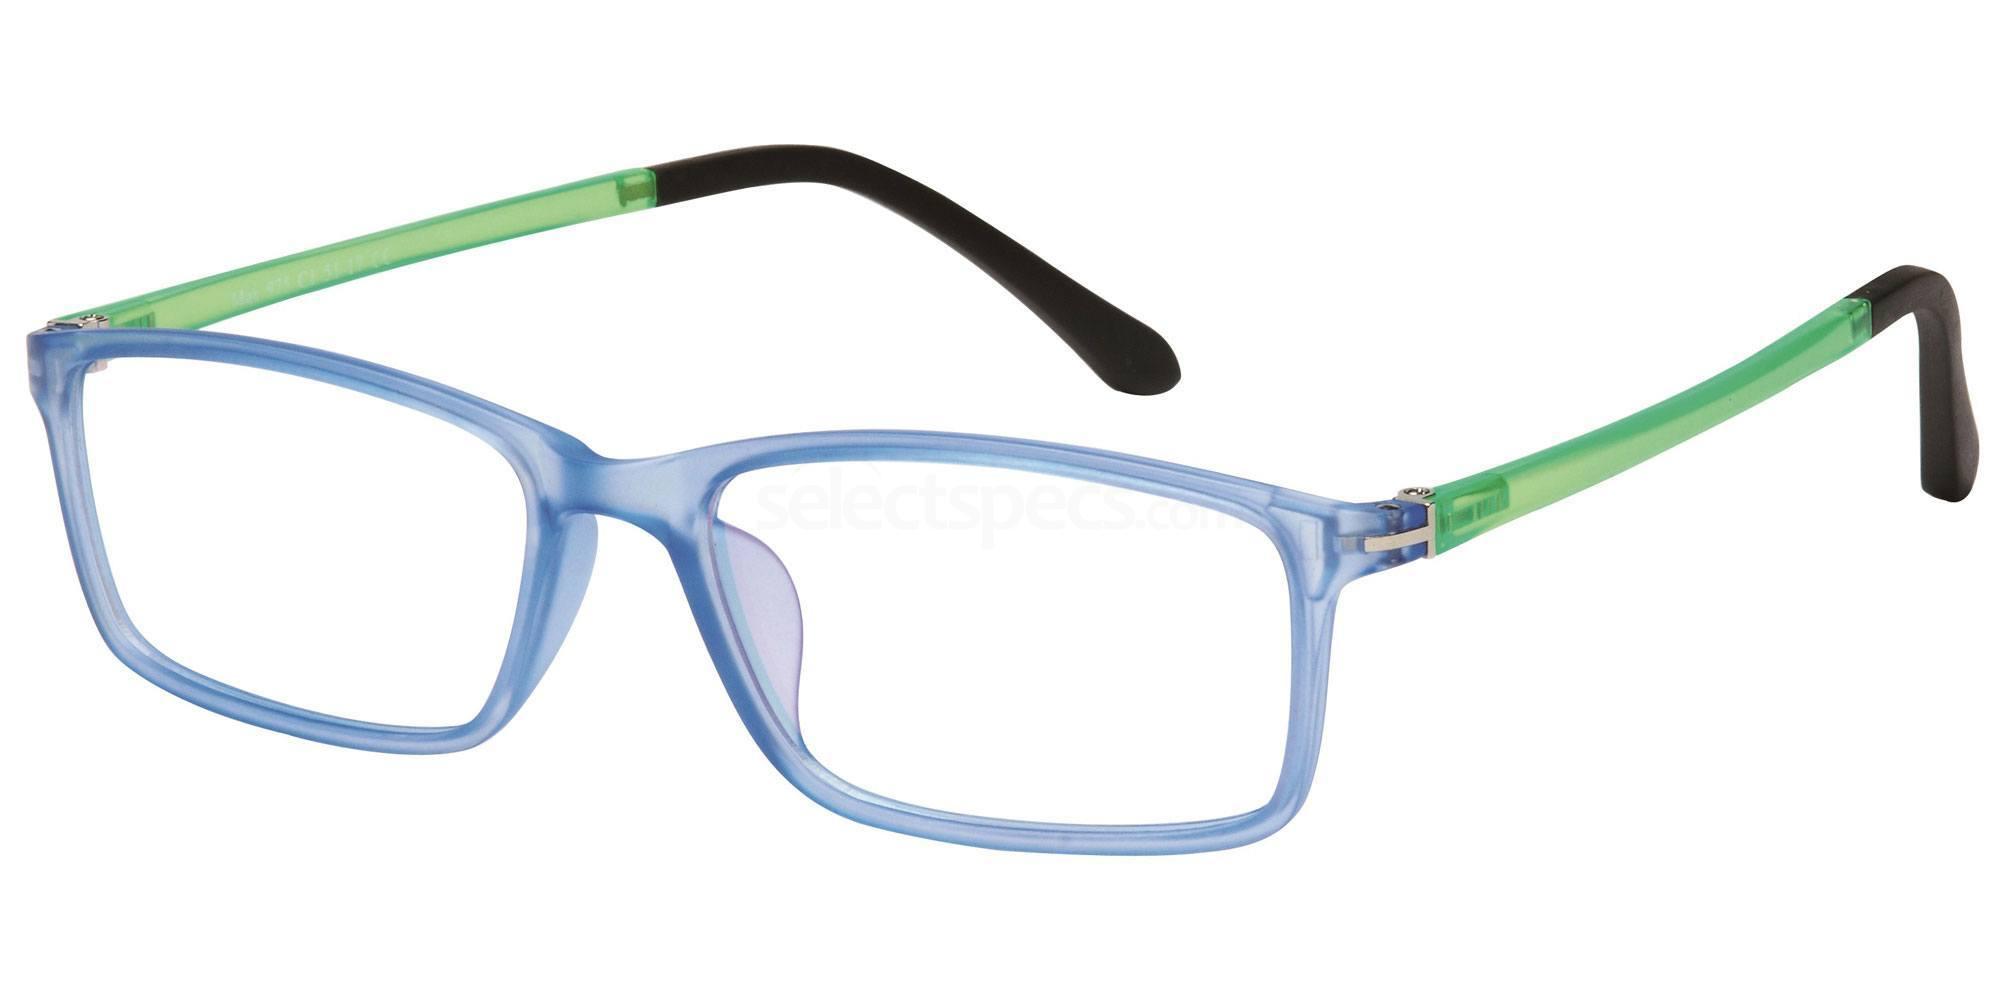 C1 M975 Glasses, Max Eyewear